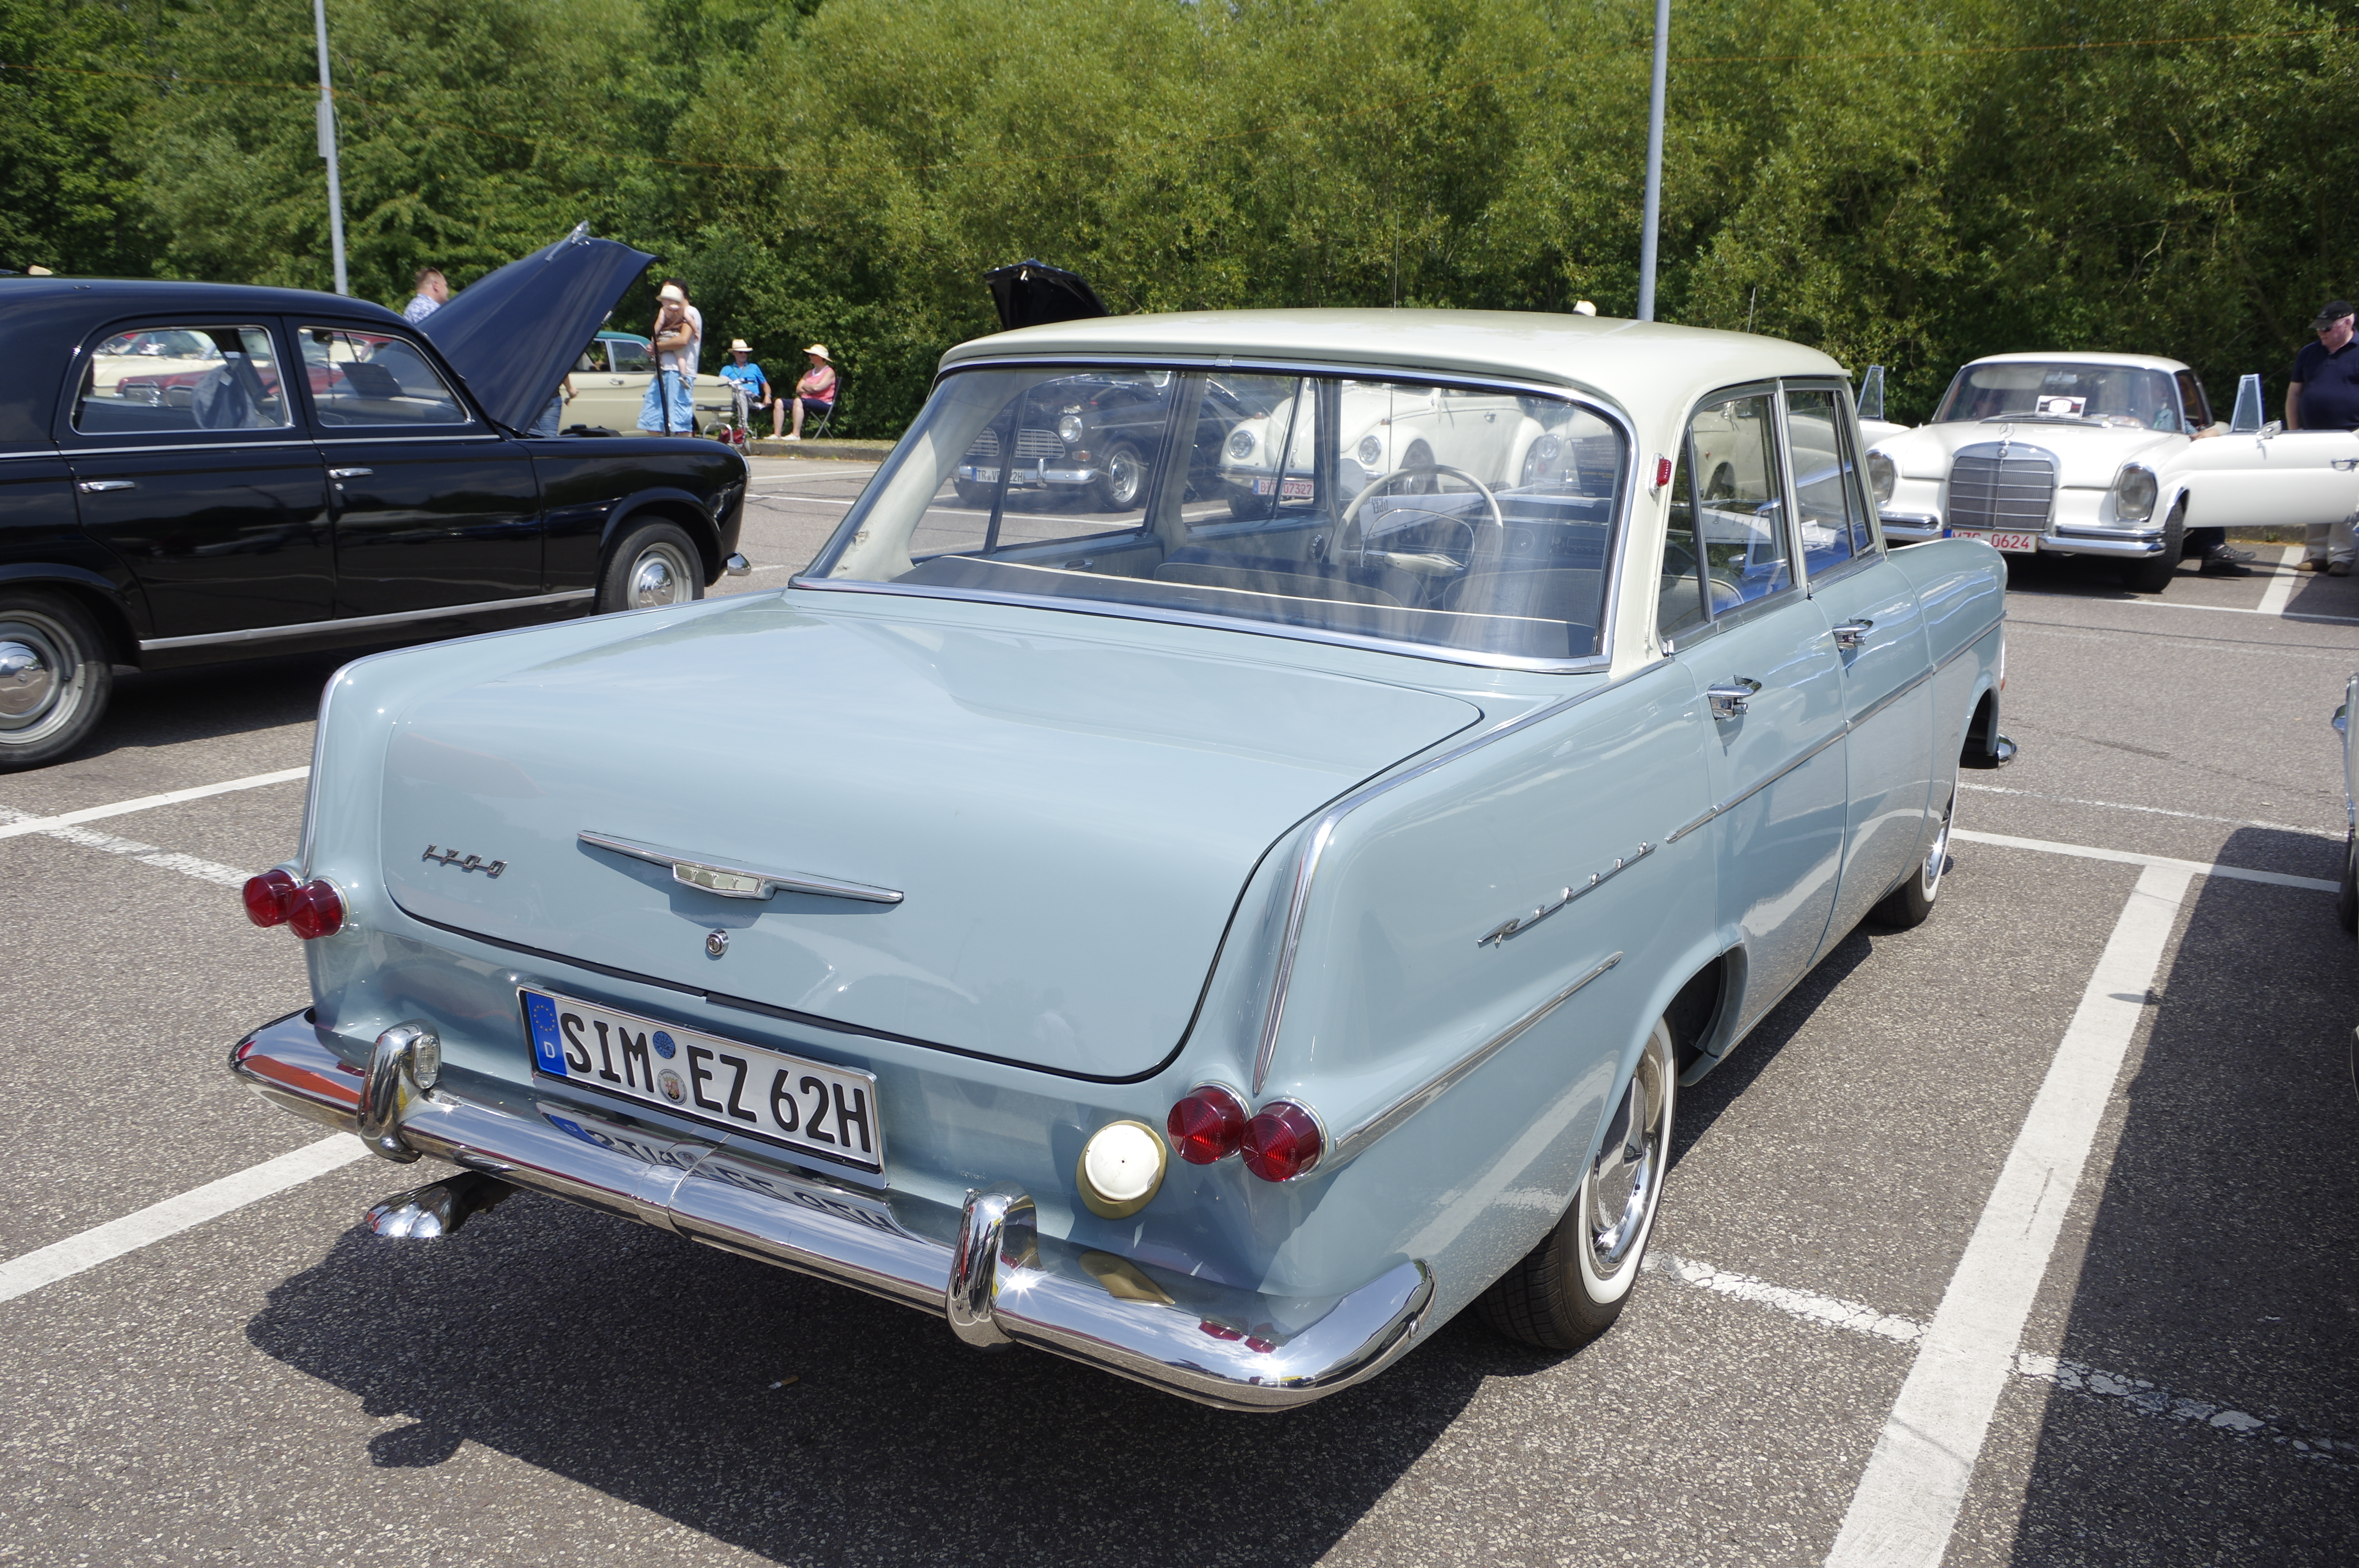 File Opel Rekord P2 Bw 2018 07 15 12 50 59 Jpg Wikimedia Commons